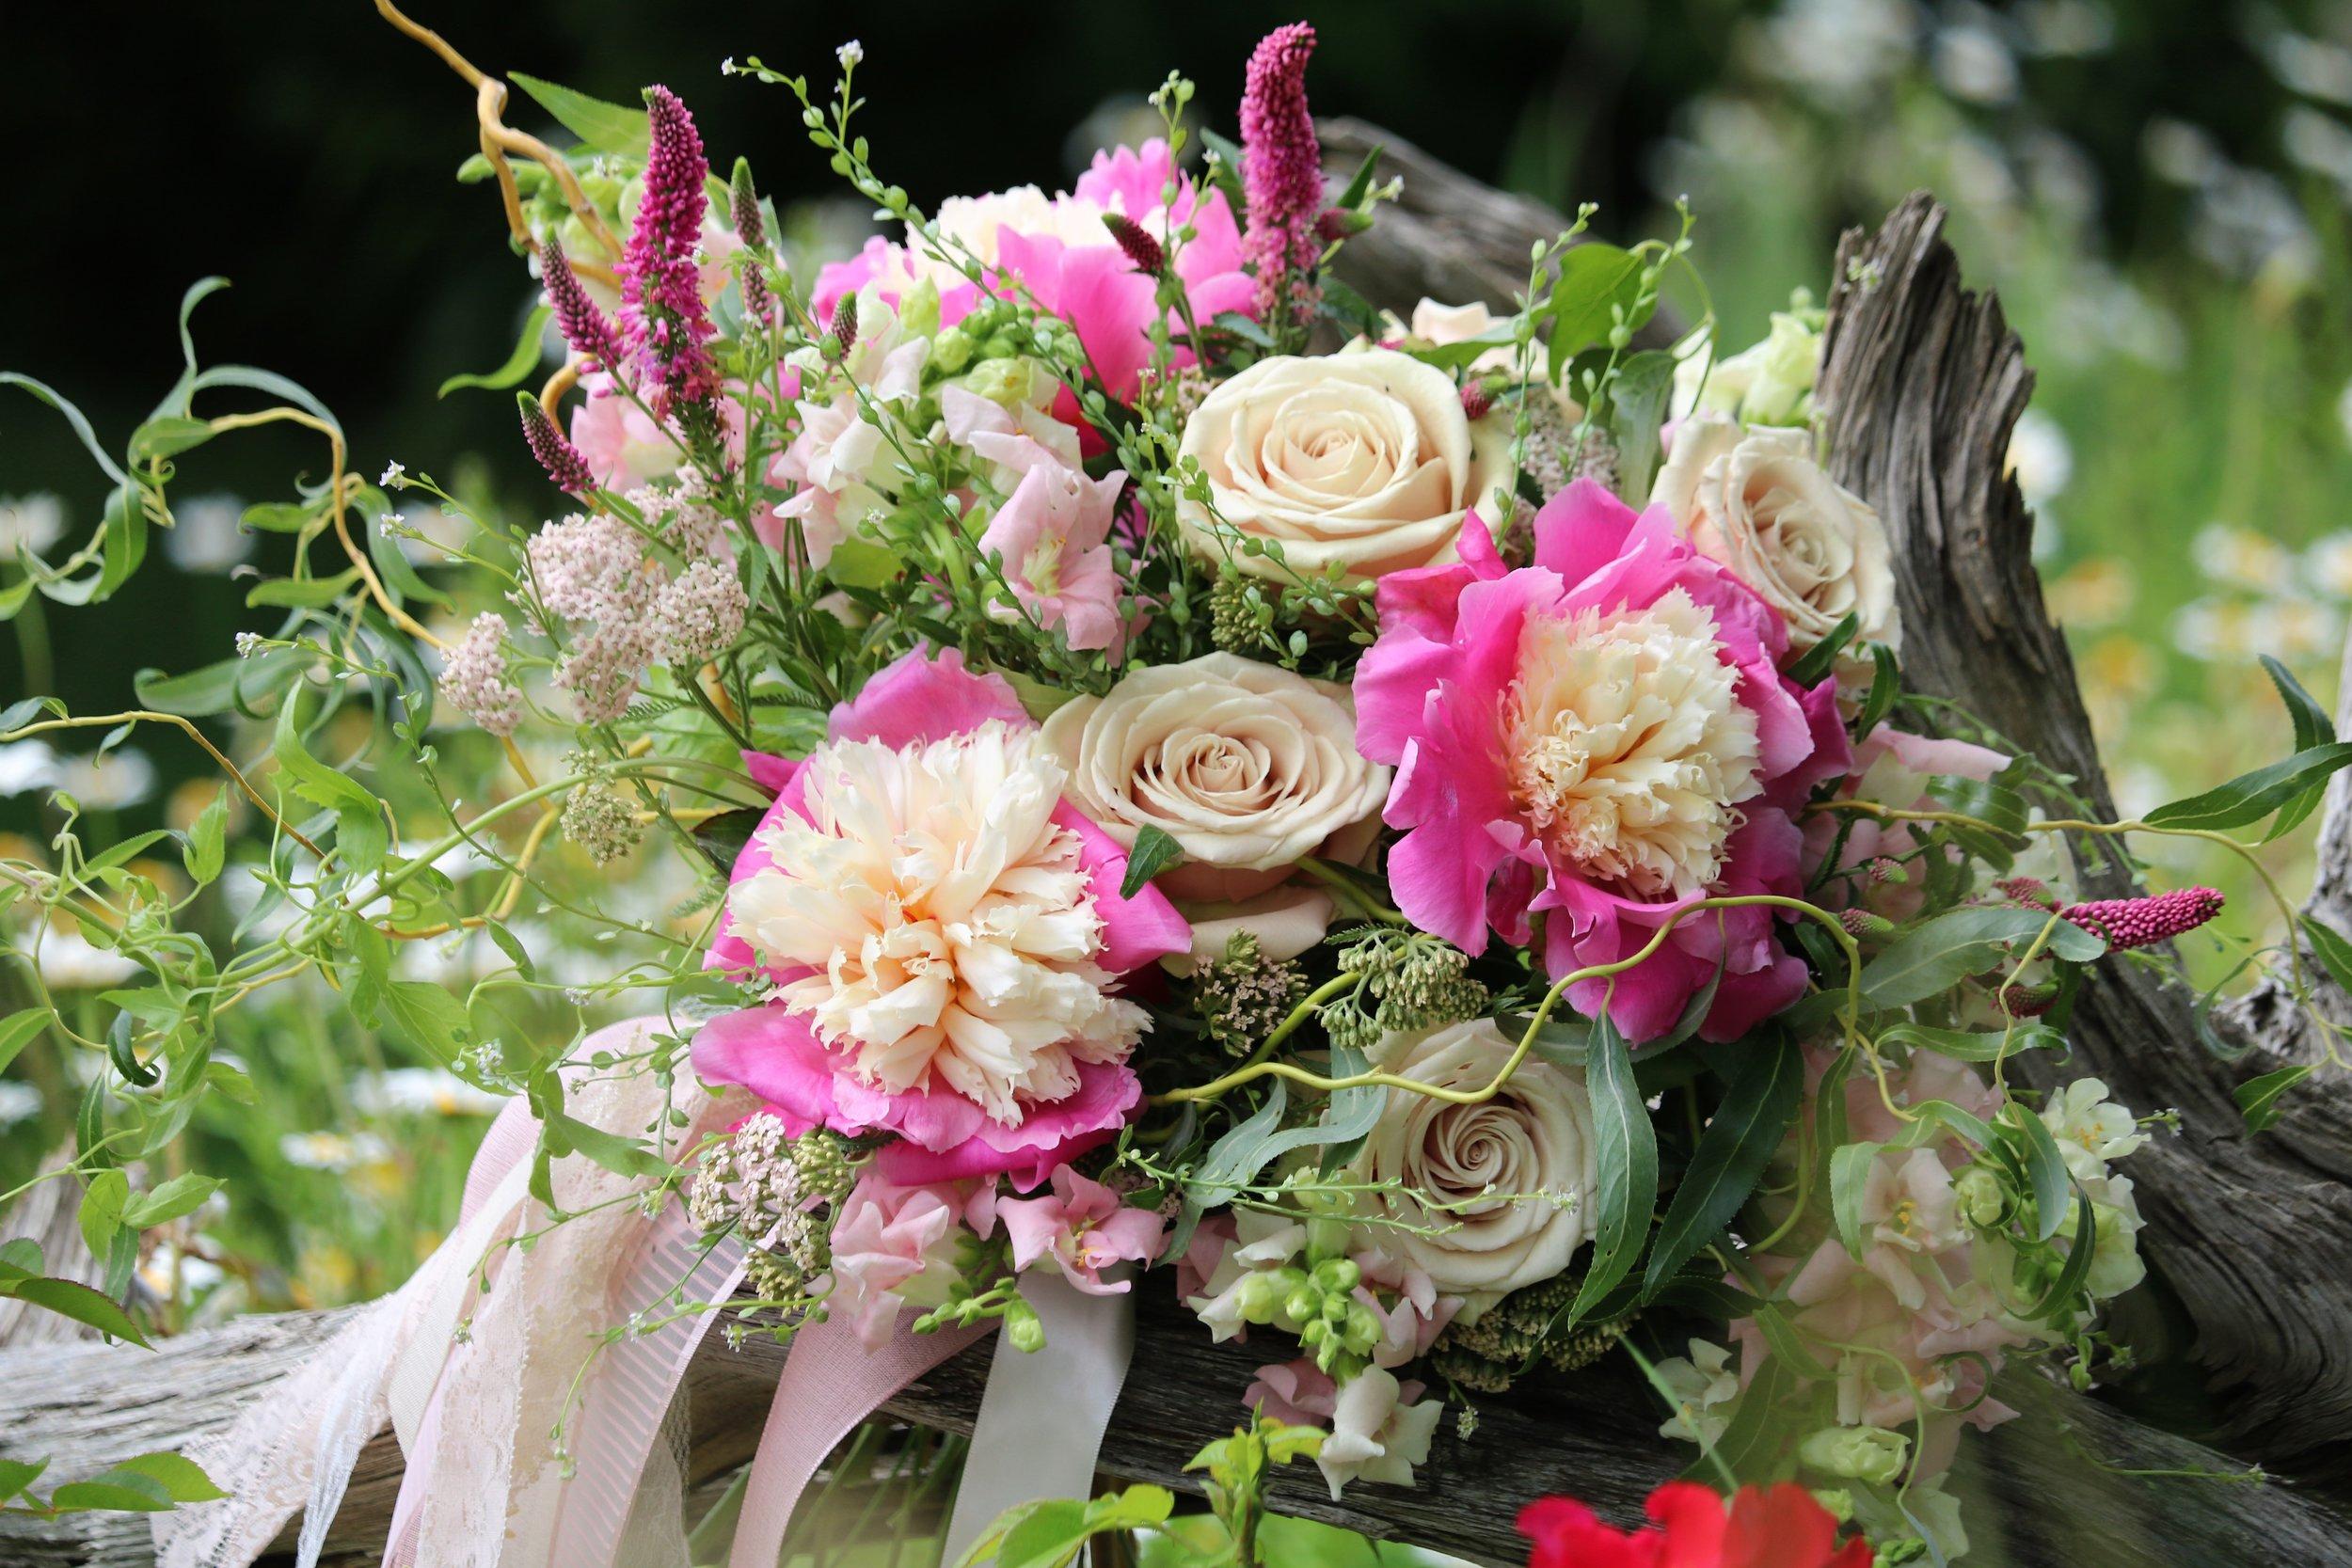 Bridal Bouquet featuring Alaska peonies